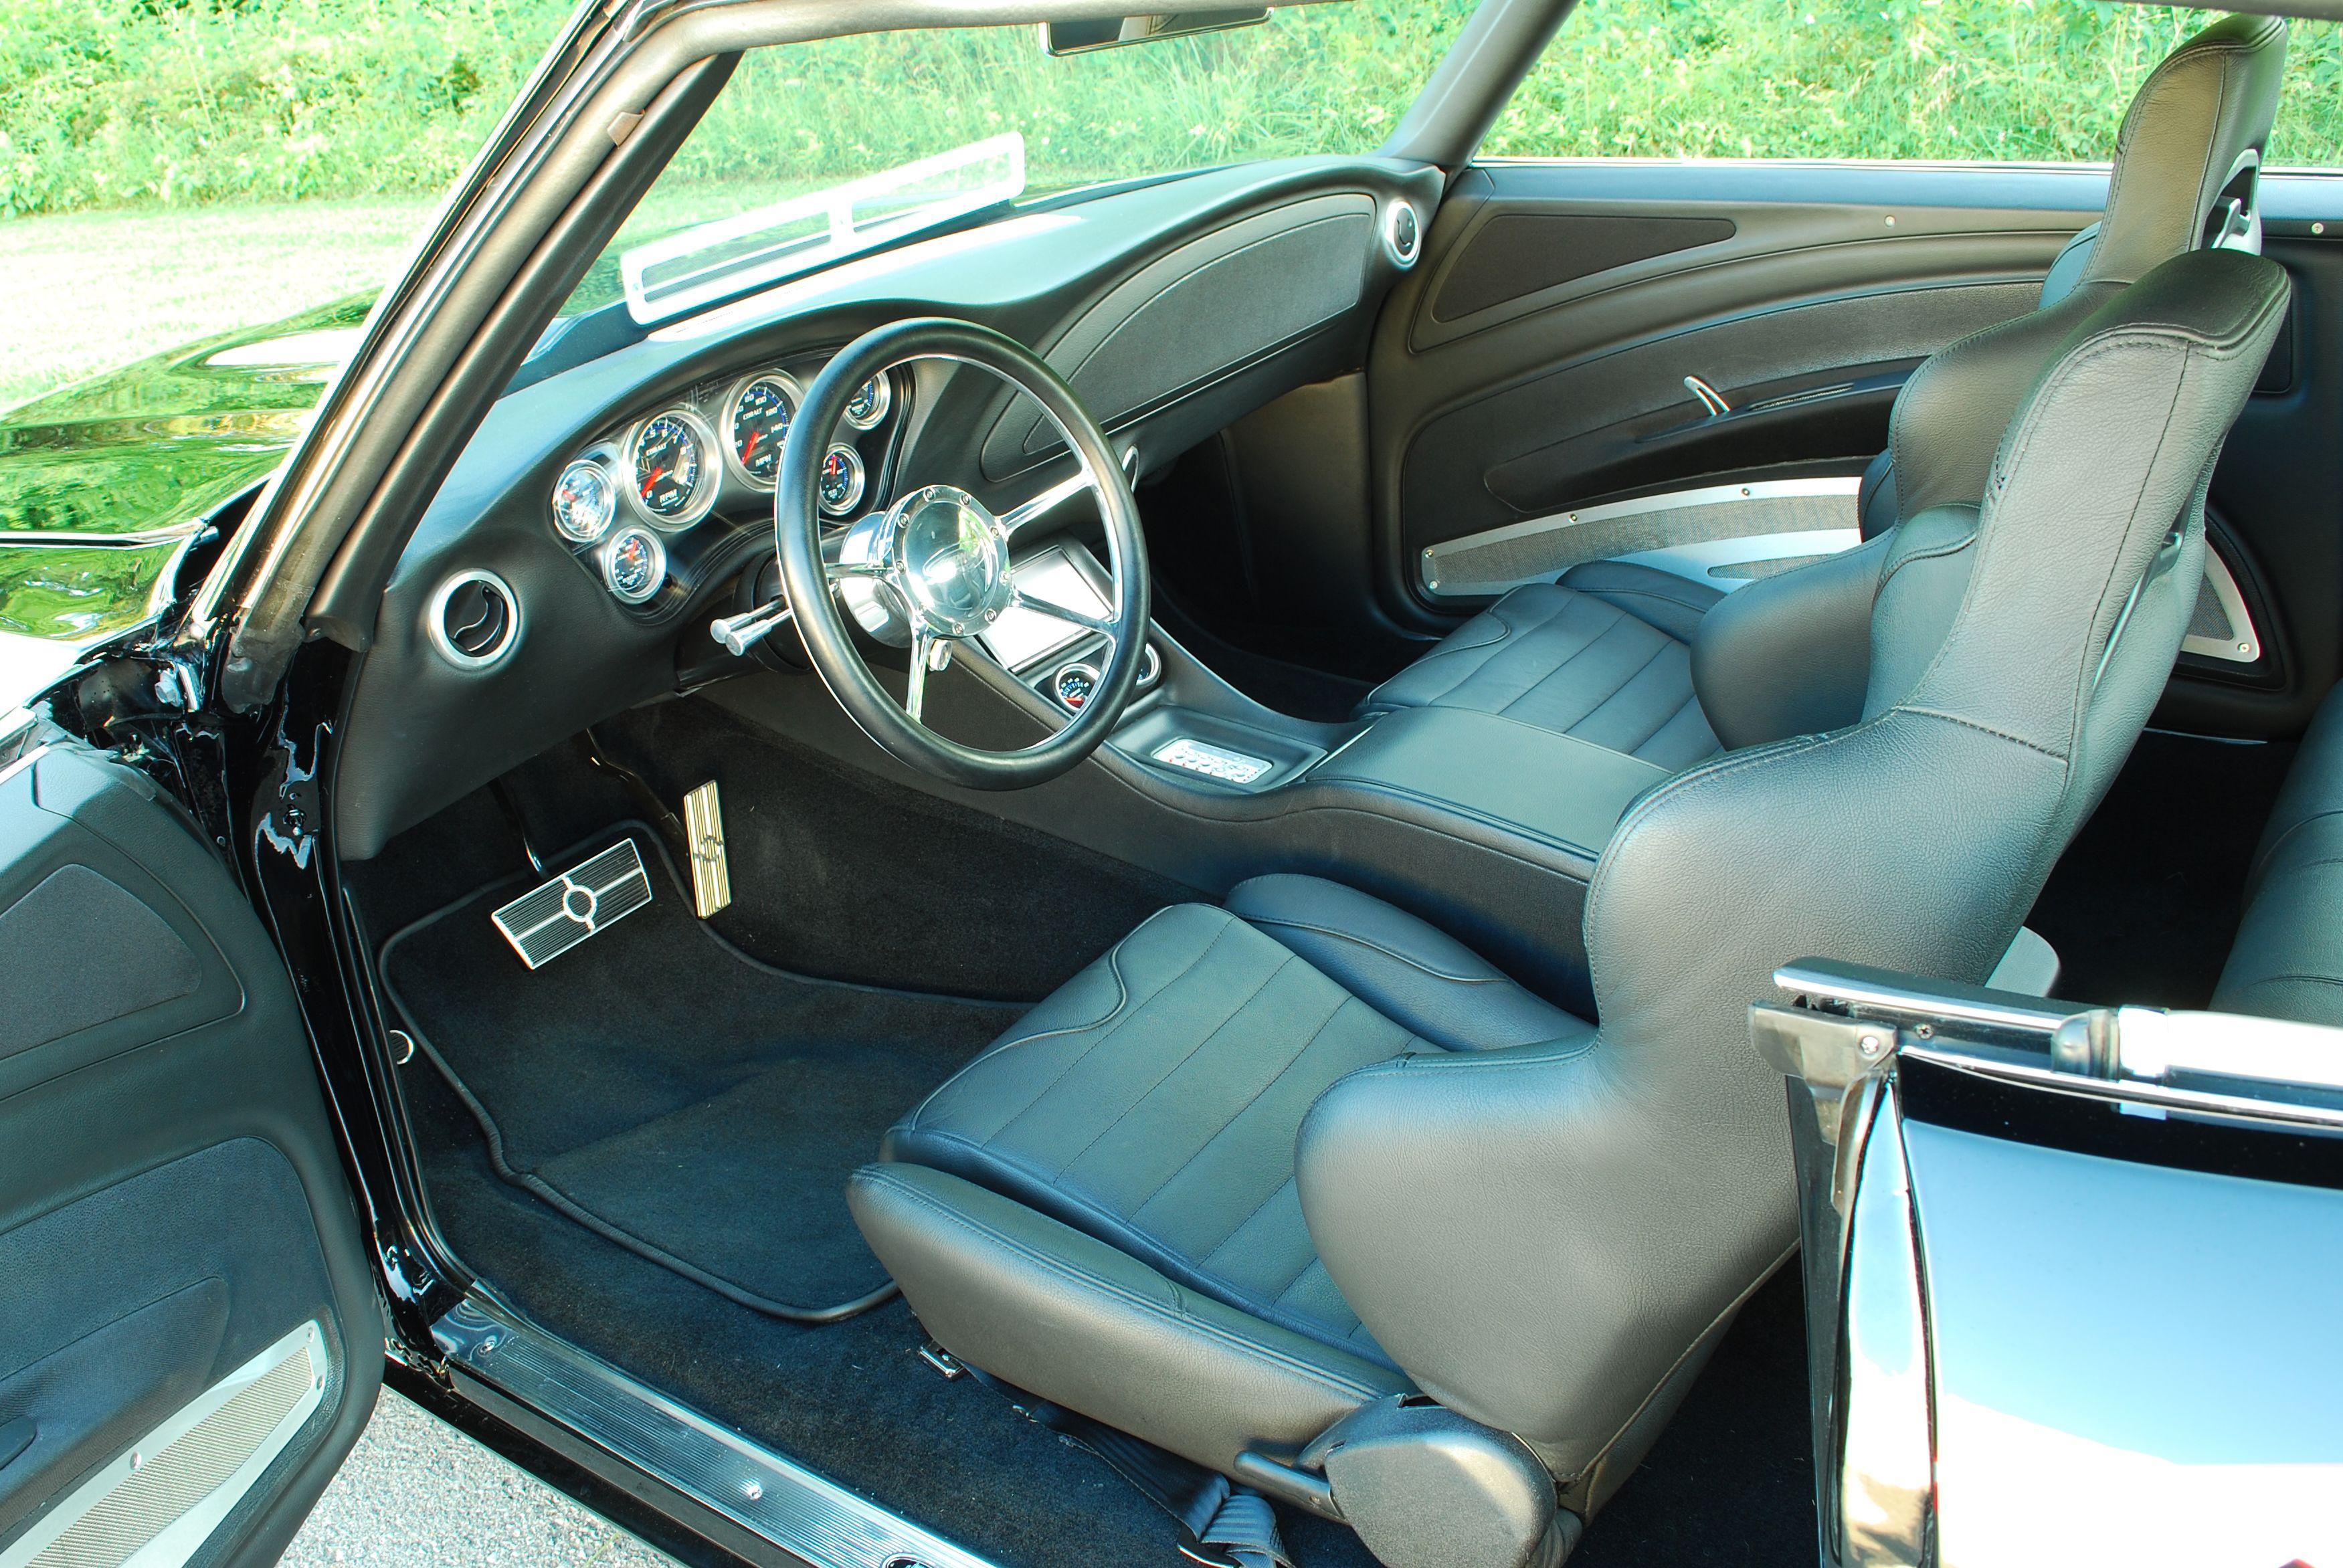 10-1970-chevrolet-pro-touring-chevelle-interior